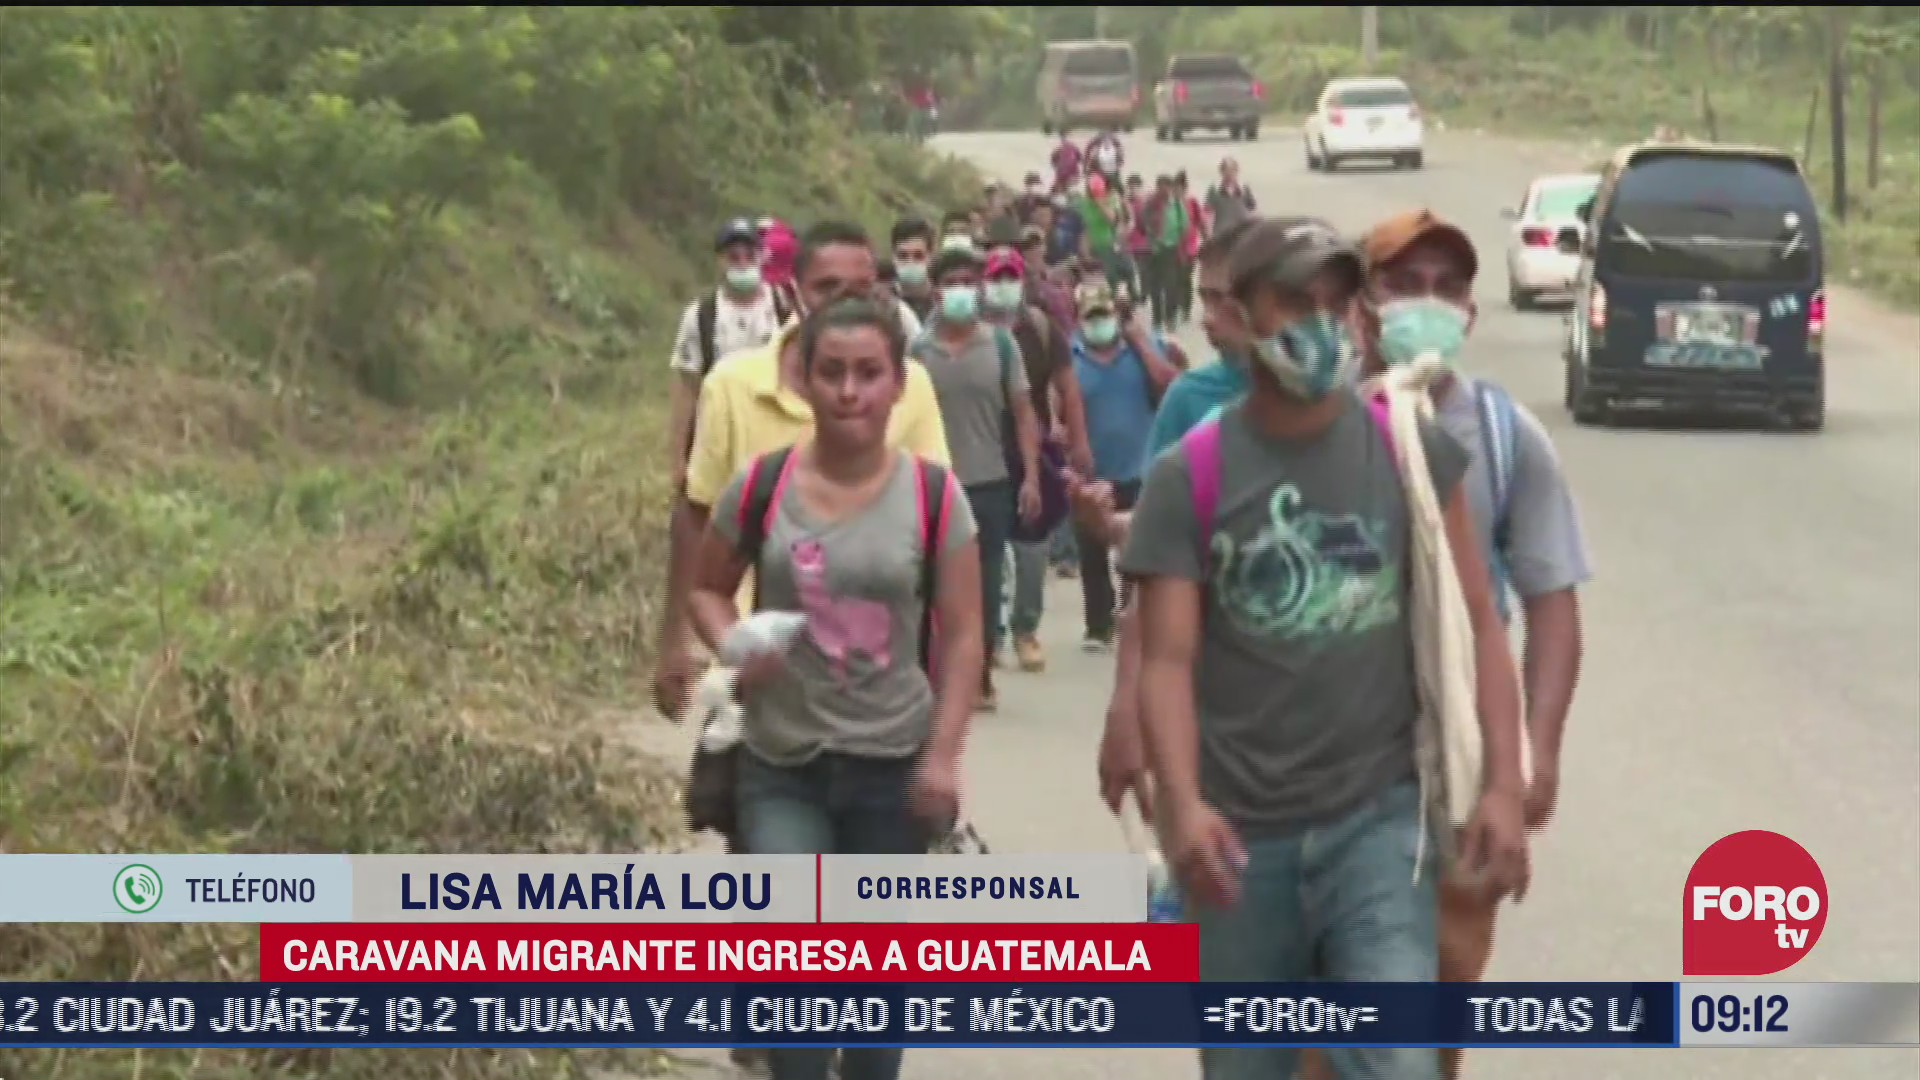 ingresan miles de migrantes a guatemala por frontera de honduras